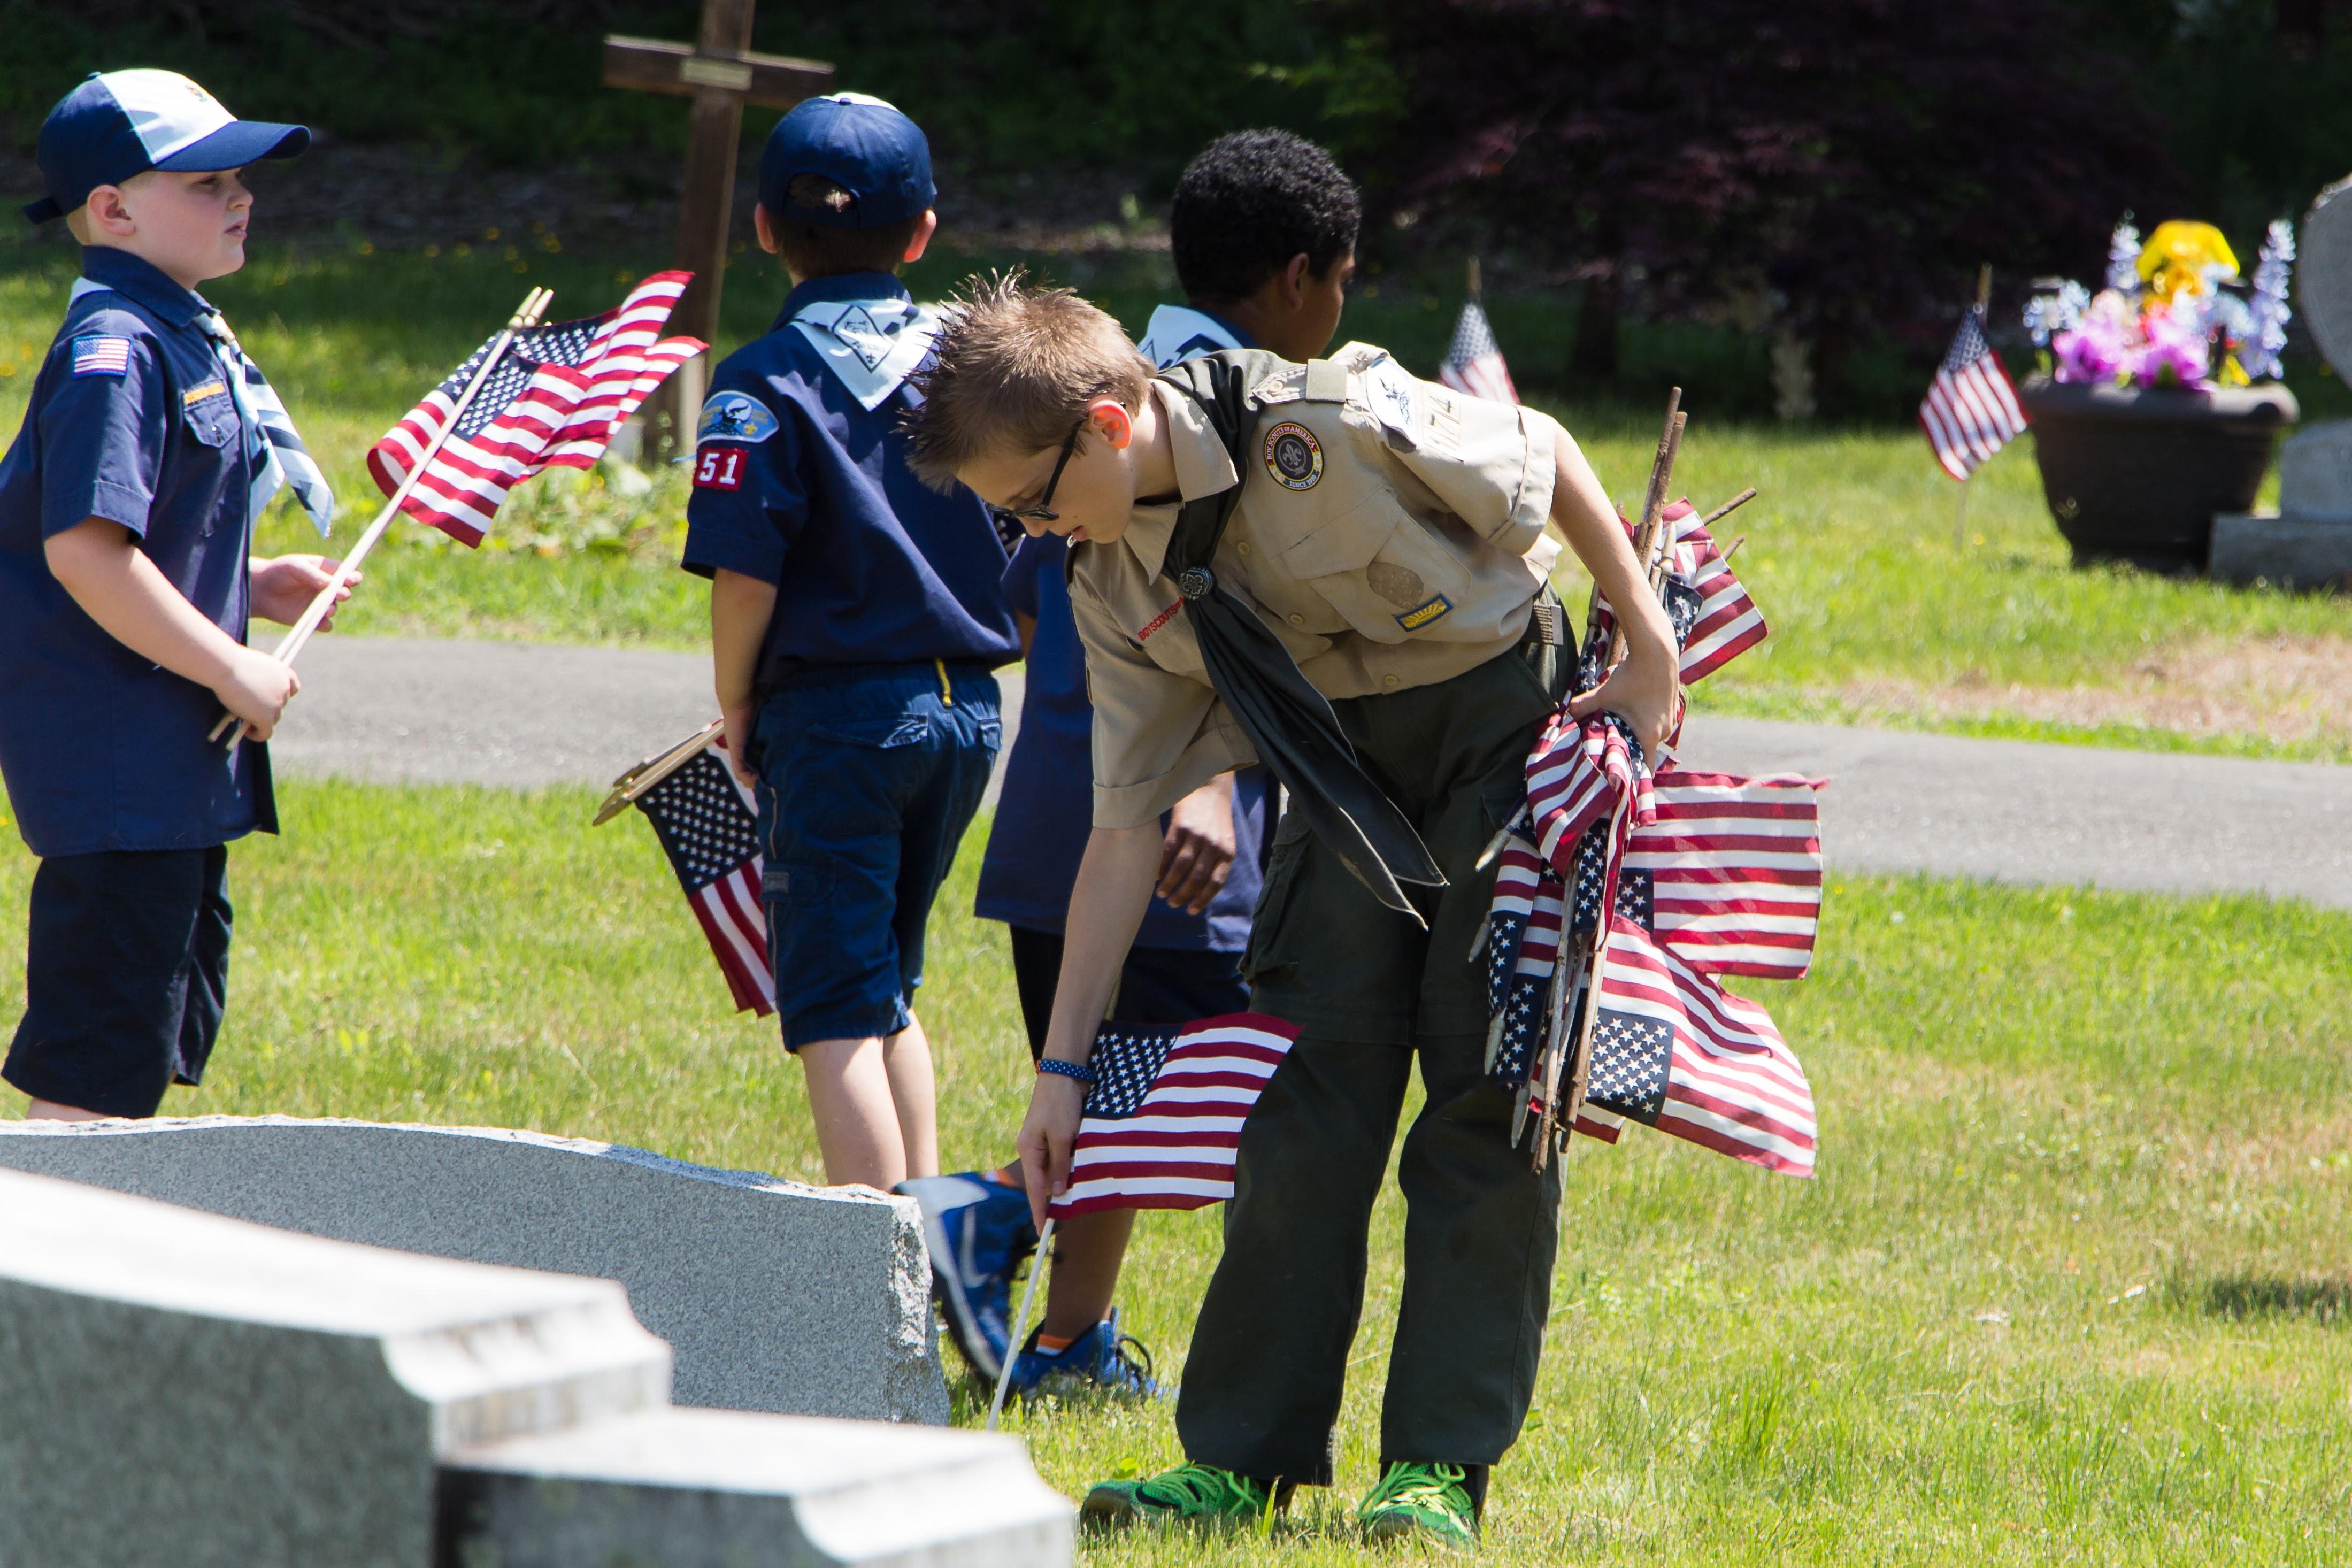 d601f9037aa424c9f1aa_20160528_Boy_Scouts_Memorial_Day_Flag_Settng_087.jpg